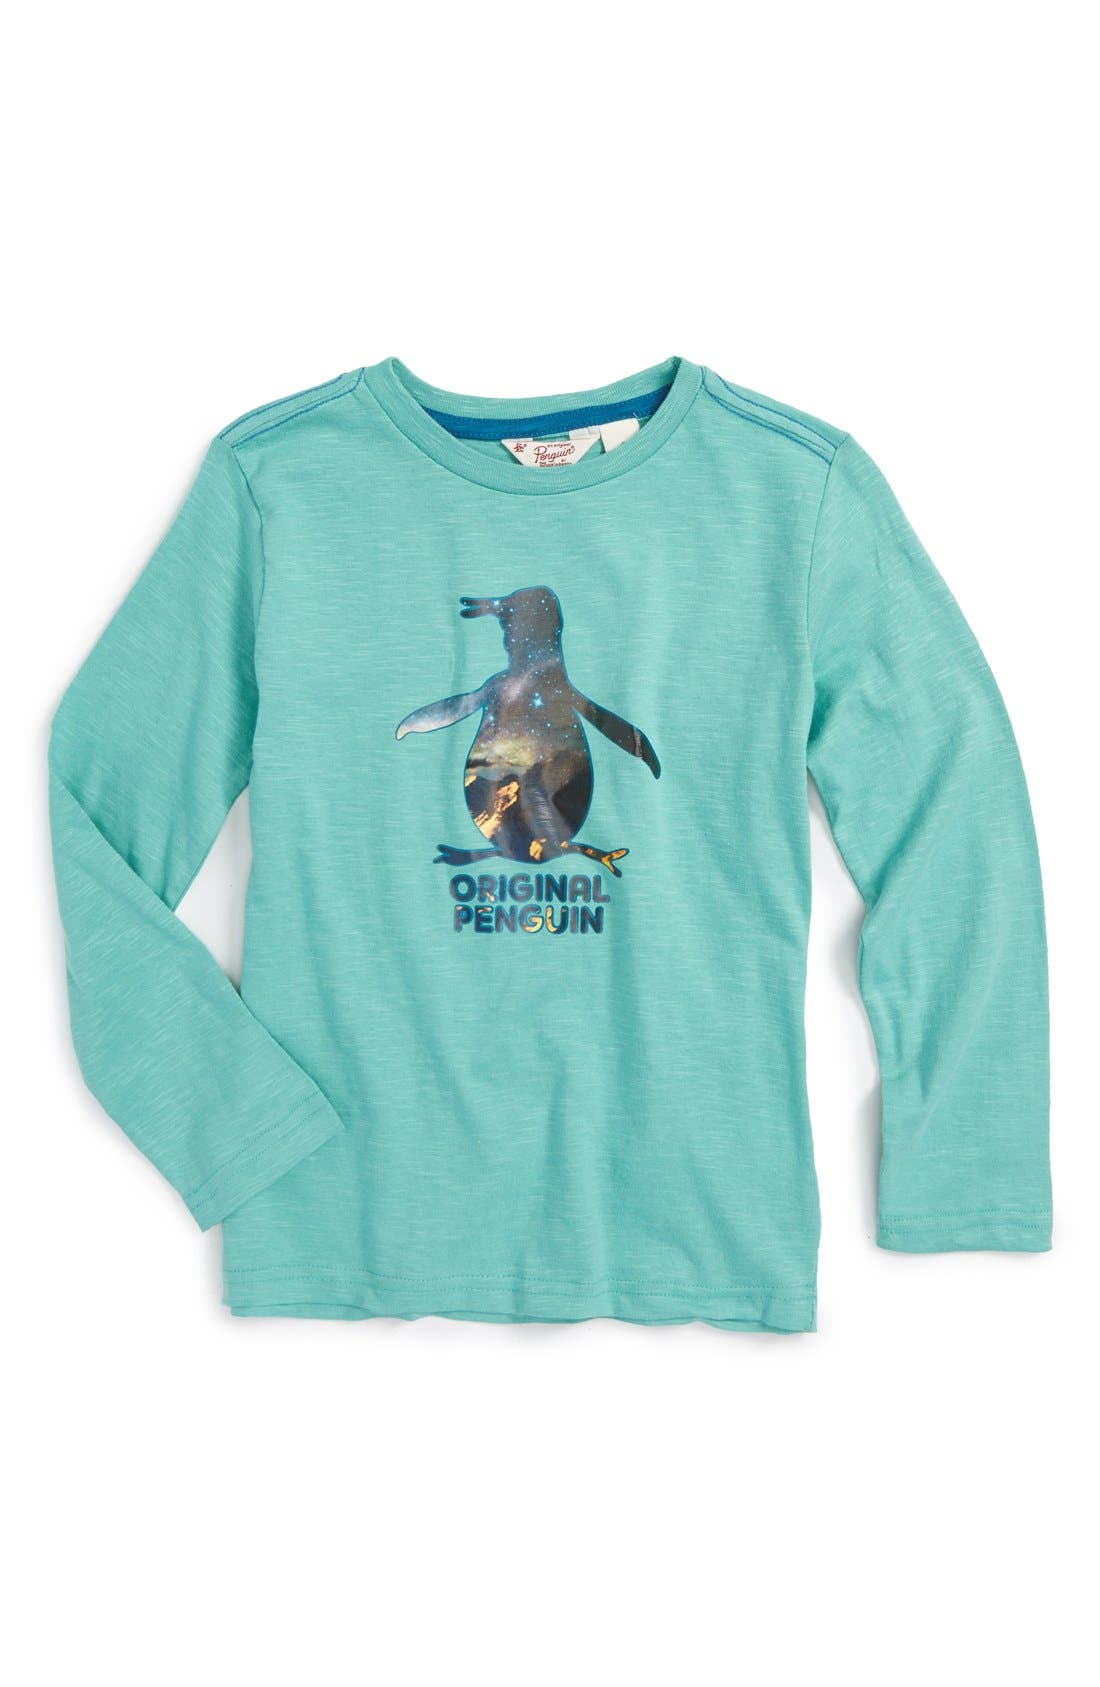 Original Penguin 'Iced Pete' Long Sleeve Slub Graphic T-Shirt (Toddler Boys, Little Boys & Big Boys)